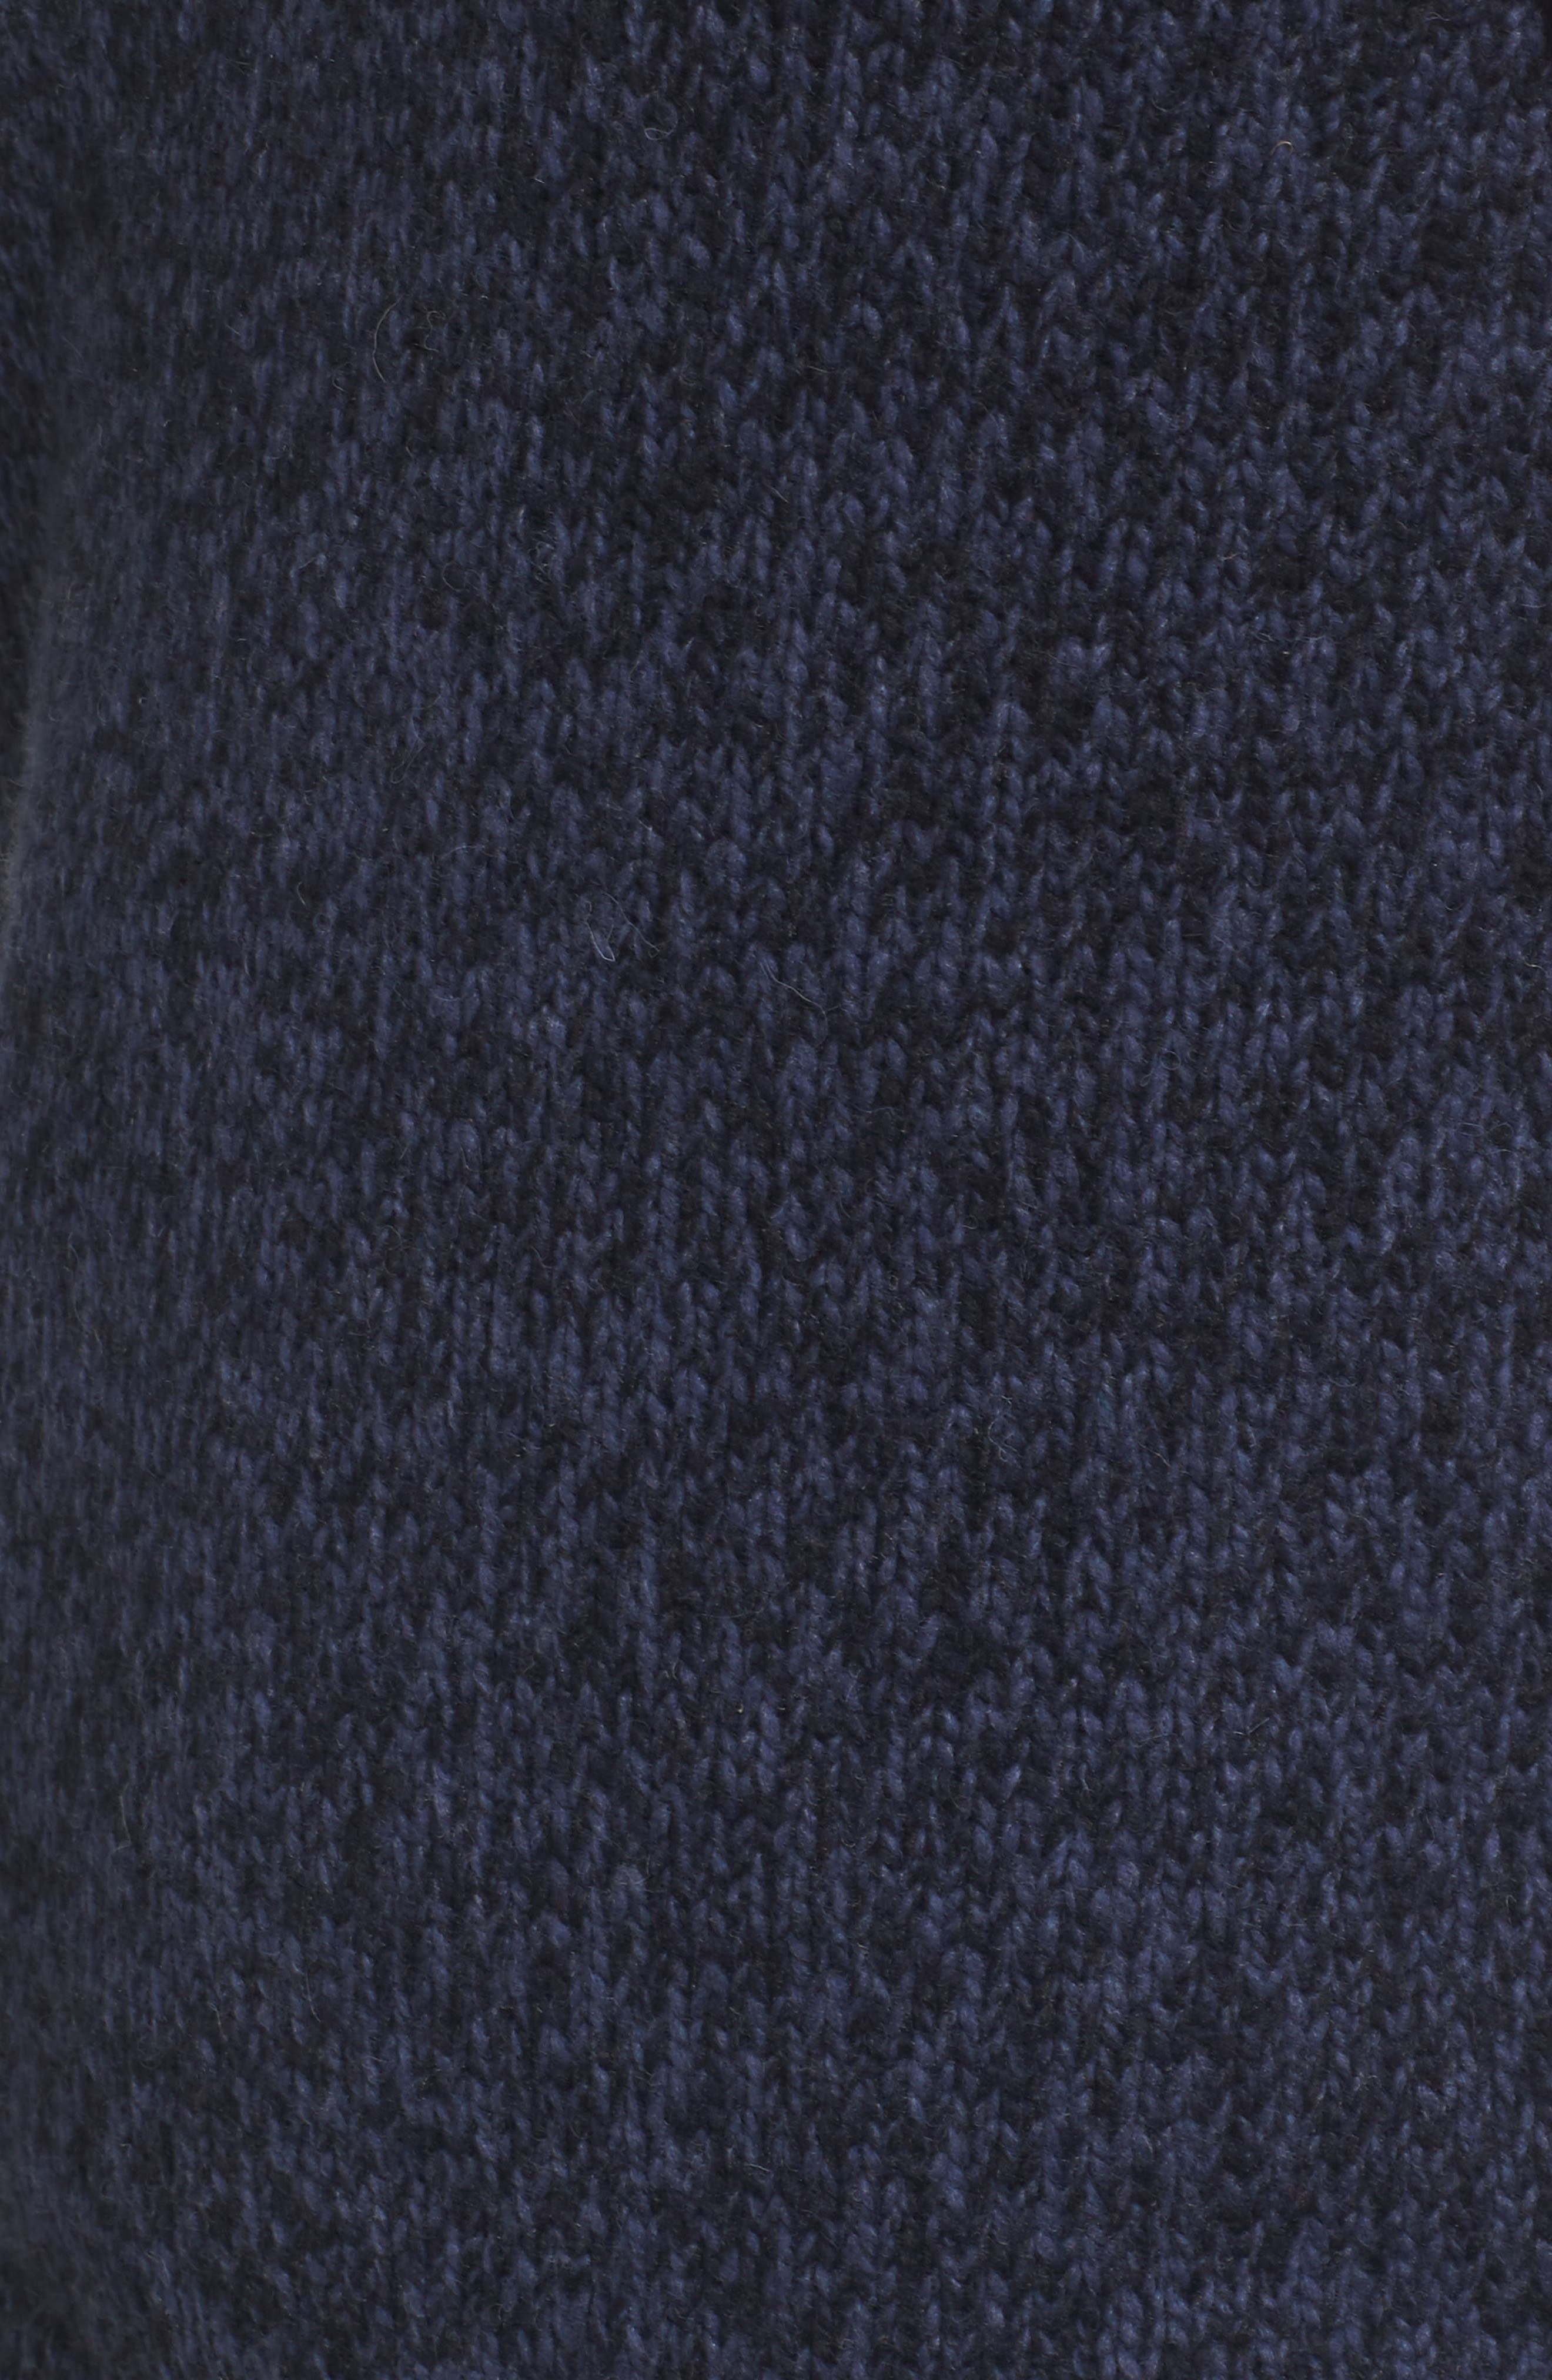 Marled Yarn Sweater,                             Alternate thumbnail 10, color,